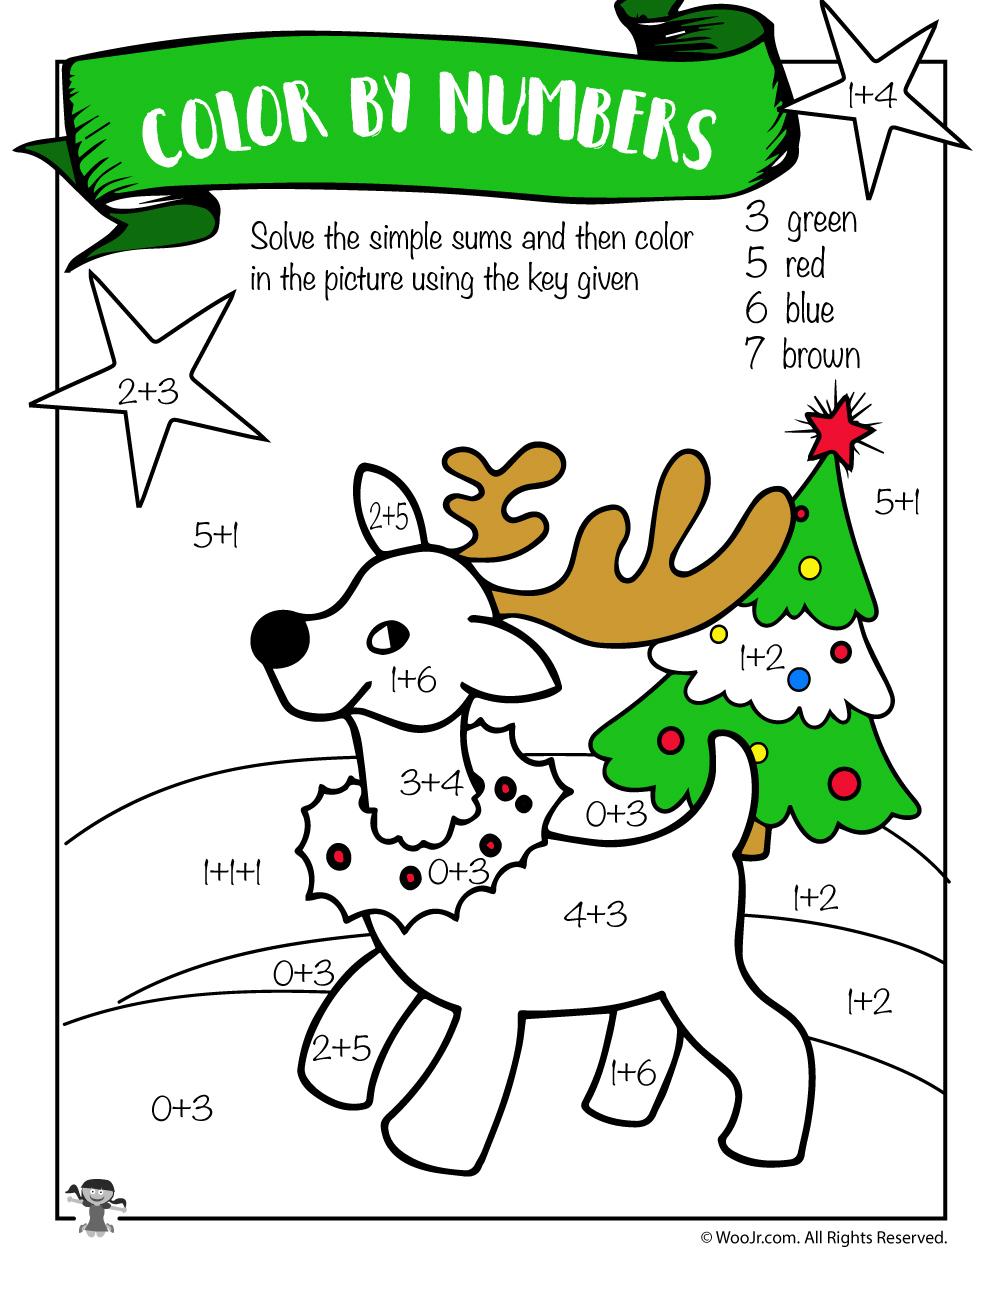 Free Printable Christmas Math Worksheets: Pre K, 1St Grade & 2Nd - Free Printable Math Coloring Worksheets For 2Nd Grade